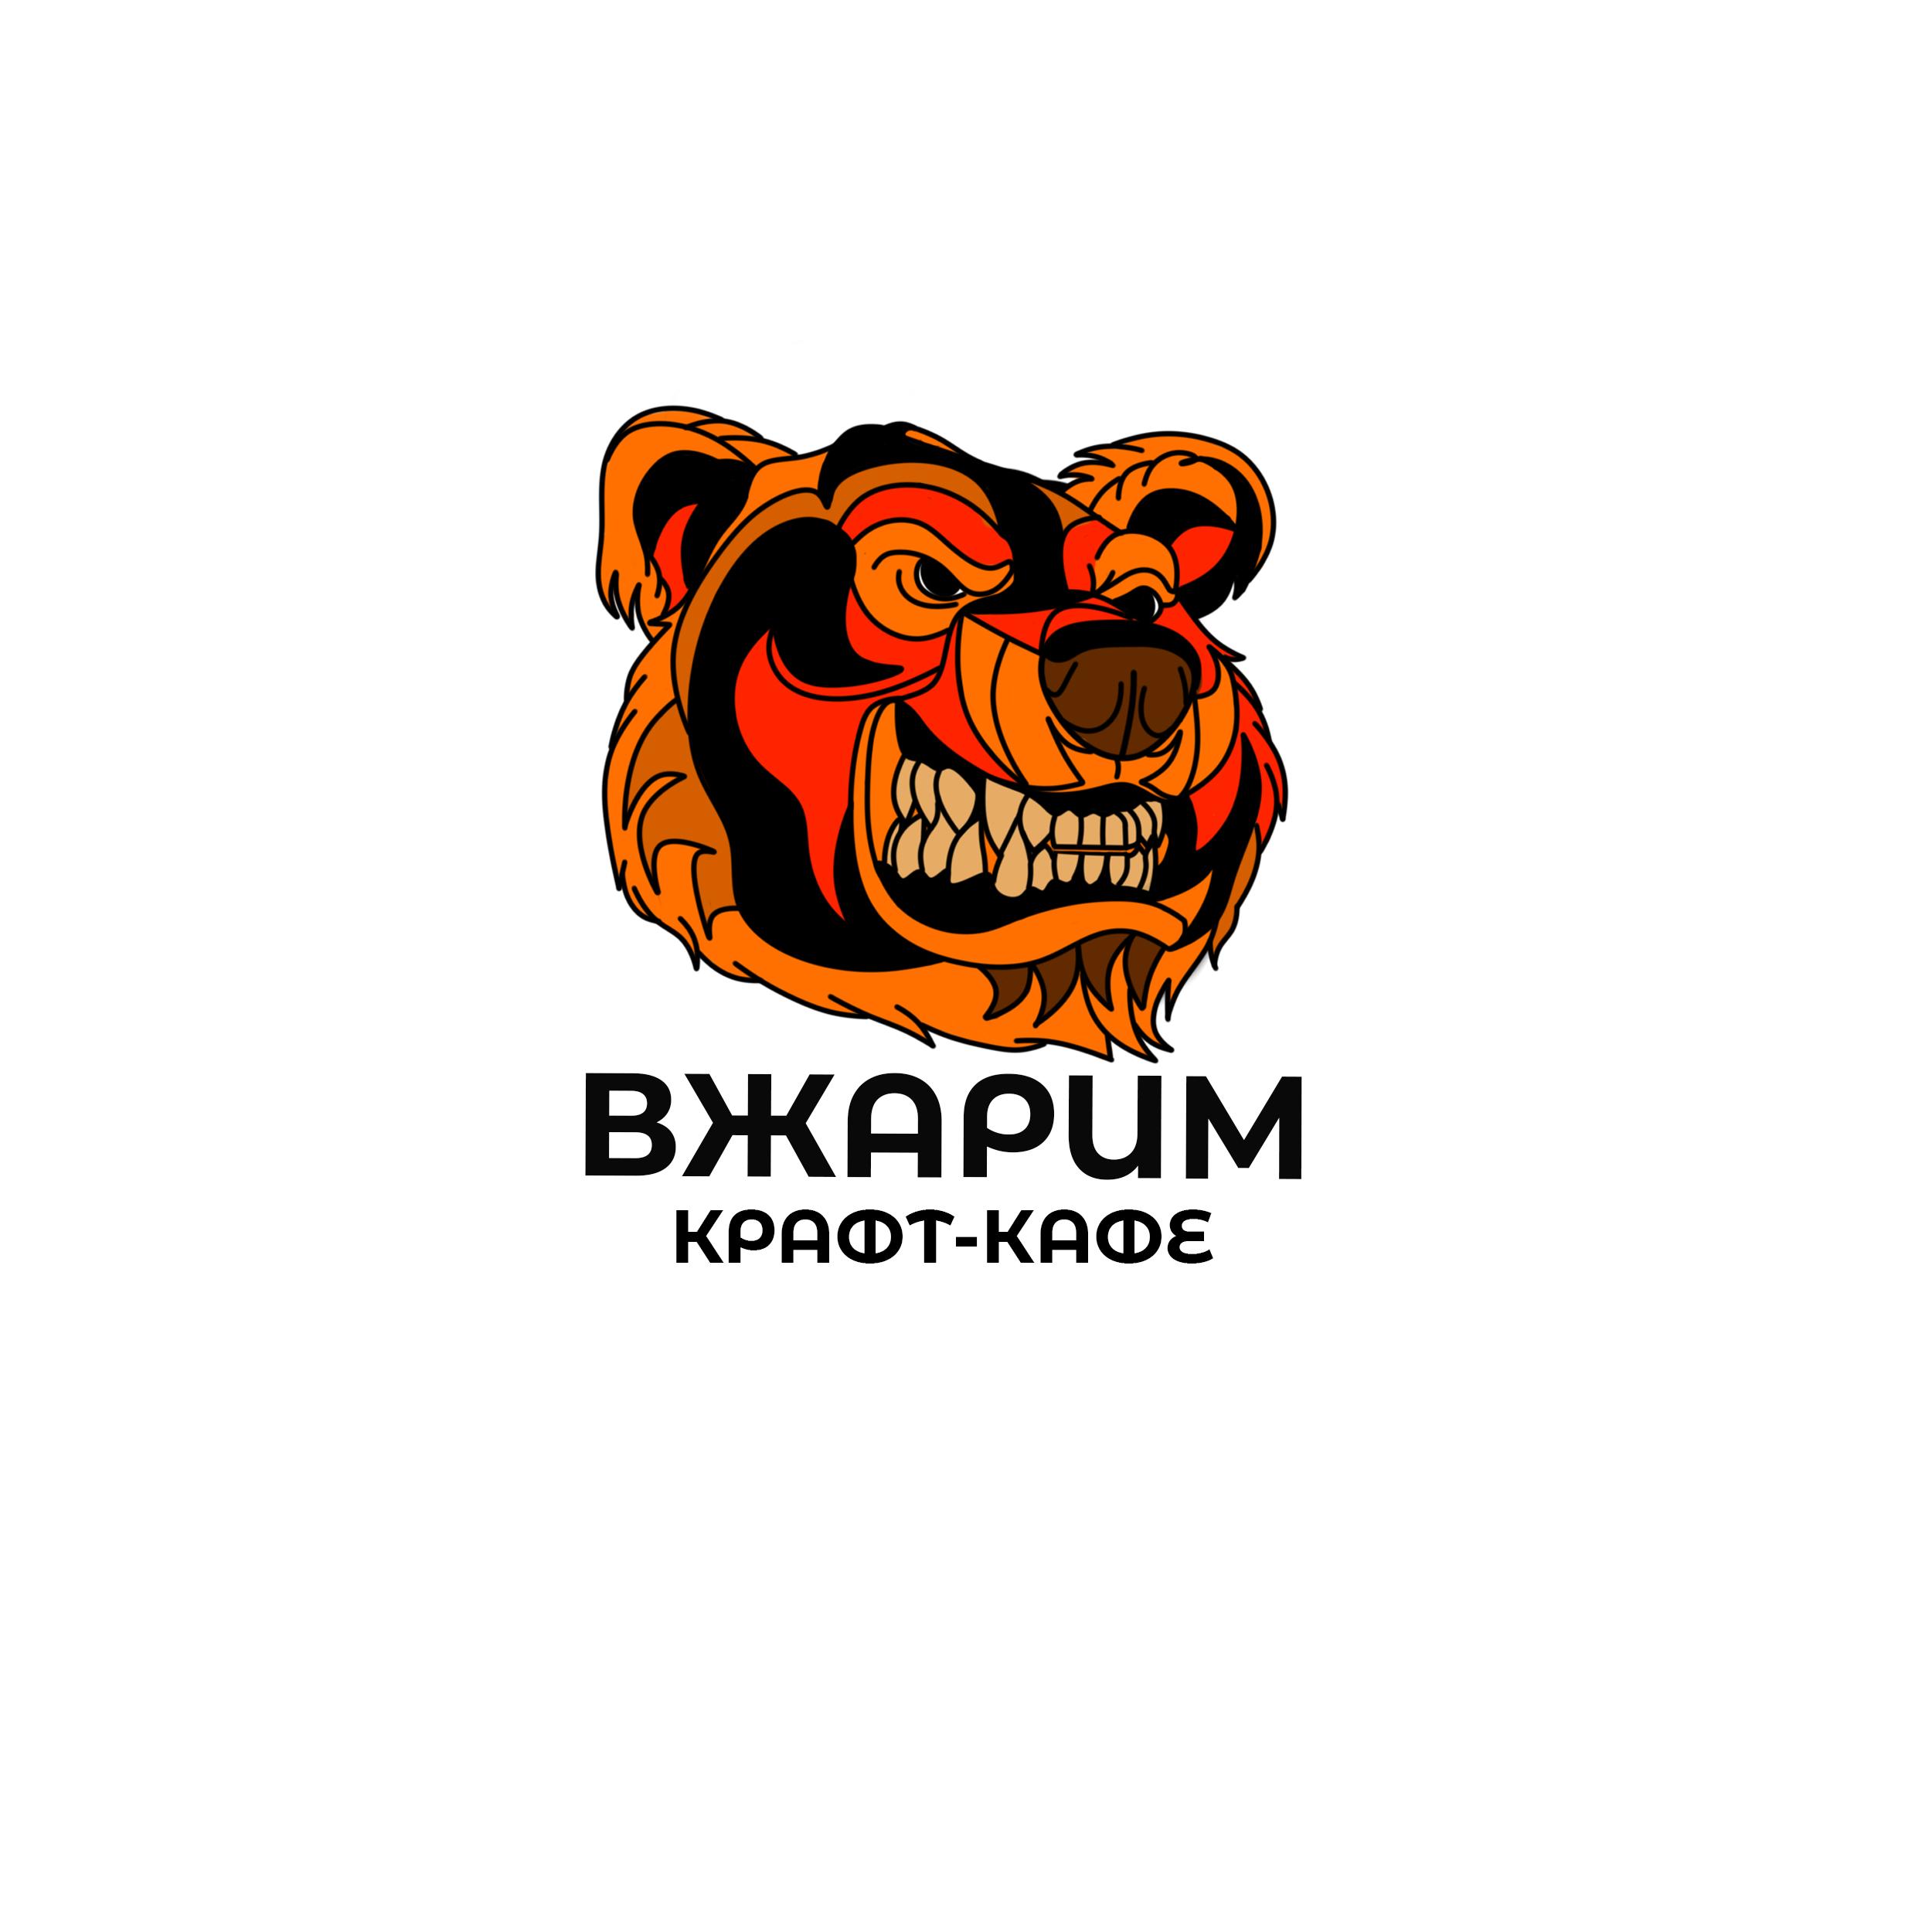 Требуется, разработка логотипа для крафт-кафе «ВЖАРИМ». фото f_41760085d4286ad4.png